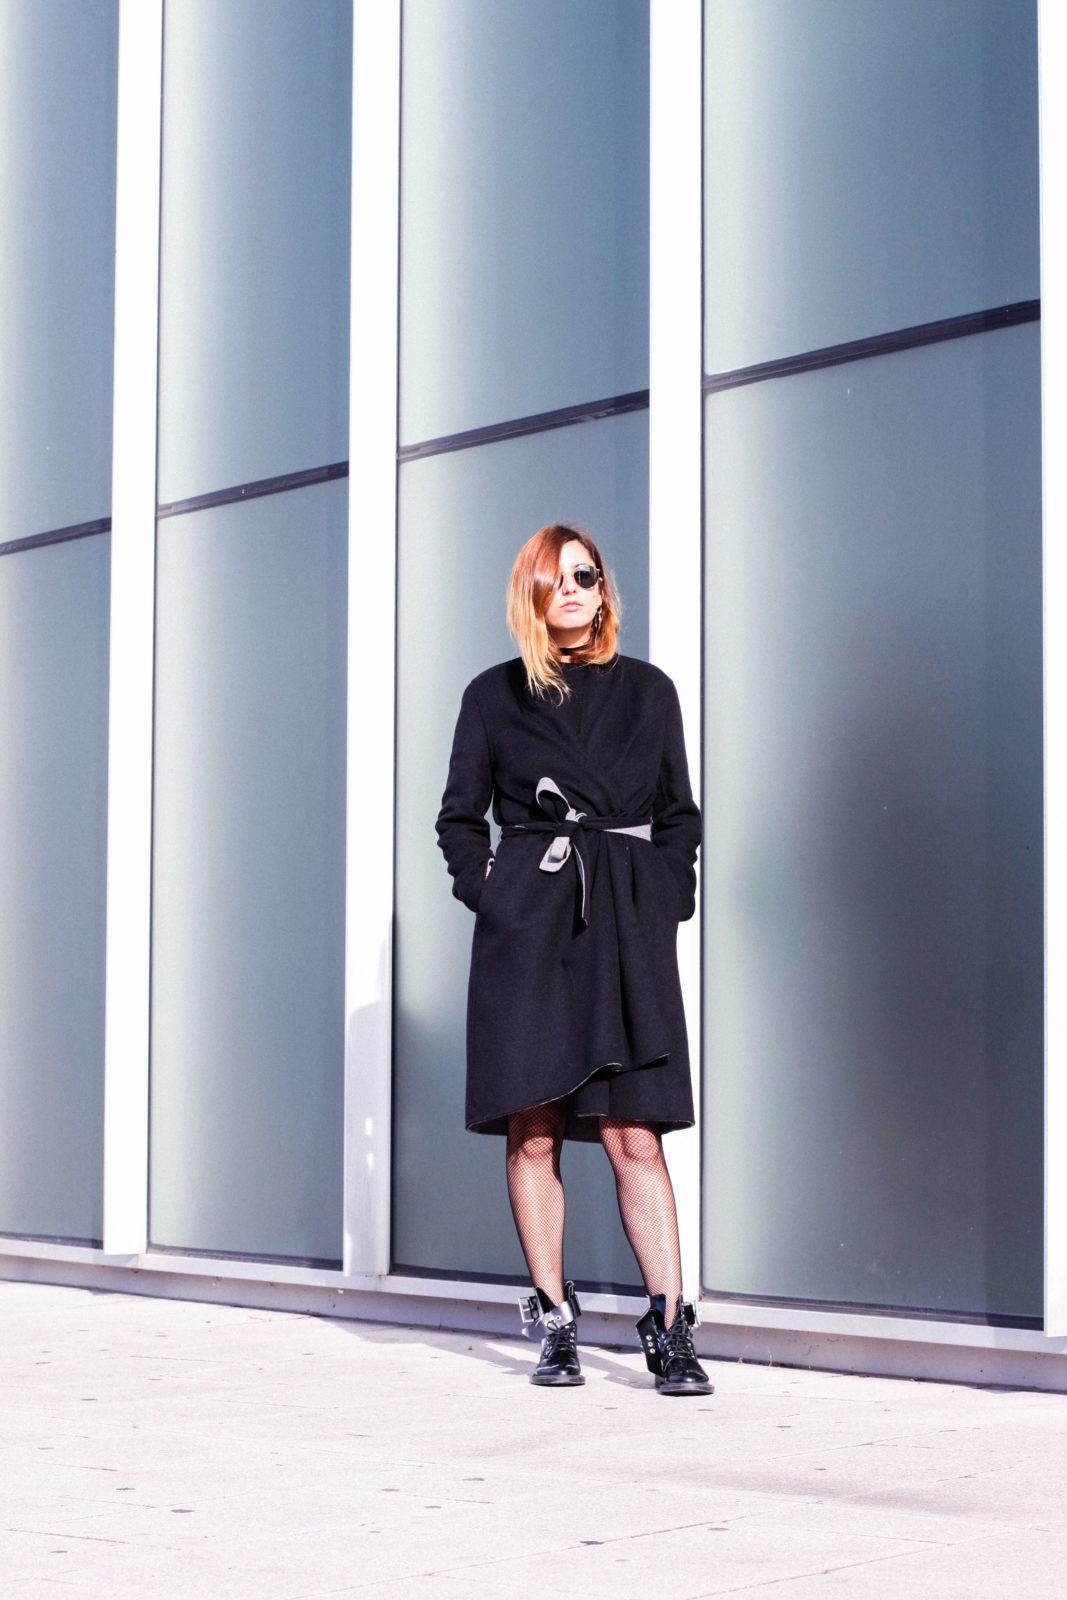 falda_dorada_shein_metalizado_medias_de_rejilla_choker_donkeycool_street_style_trends_2016-50